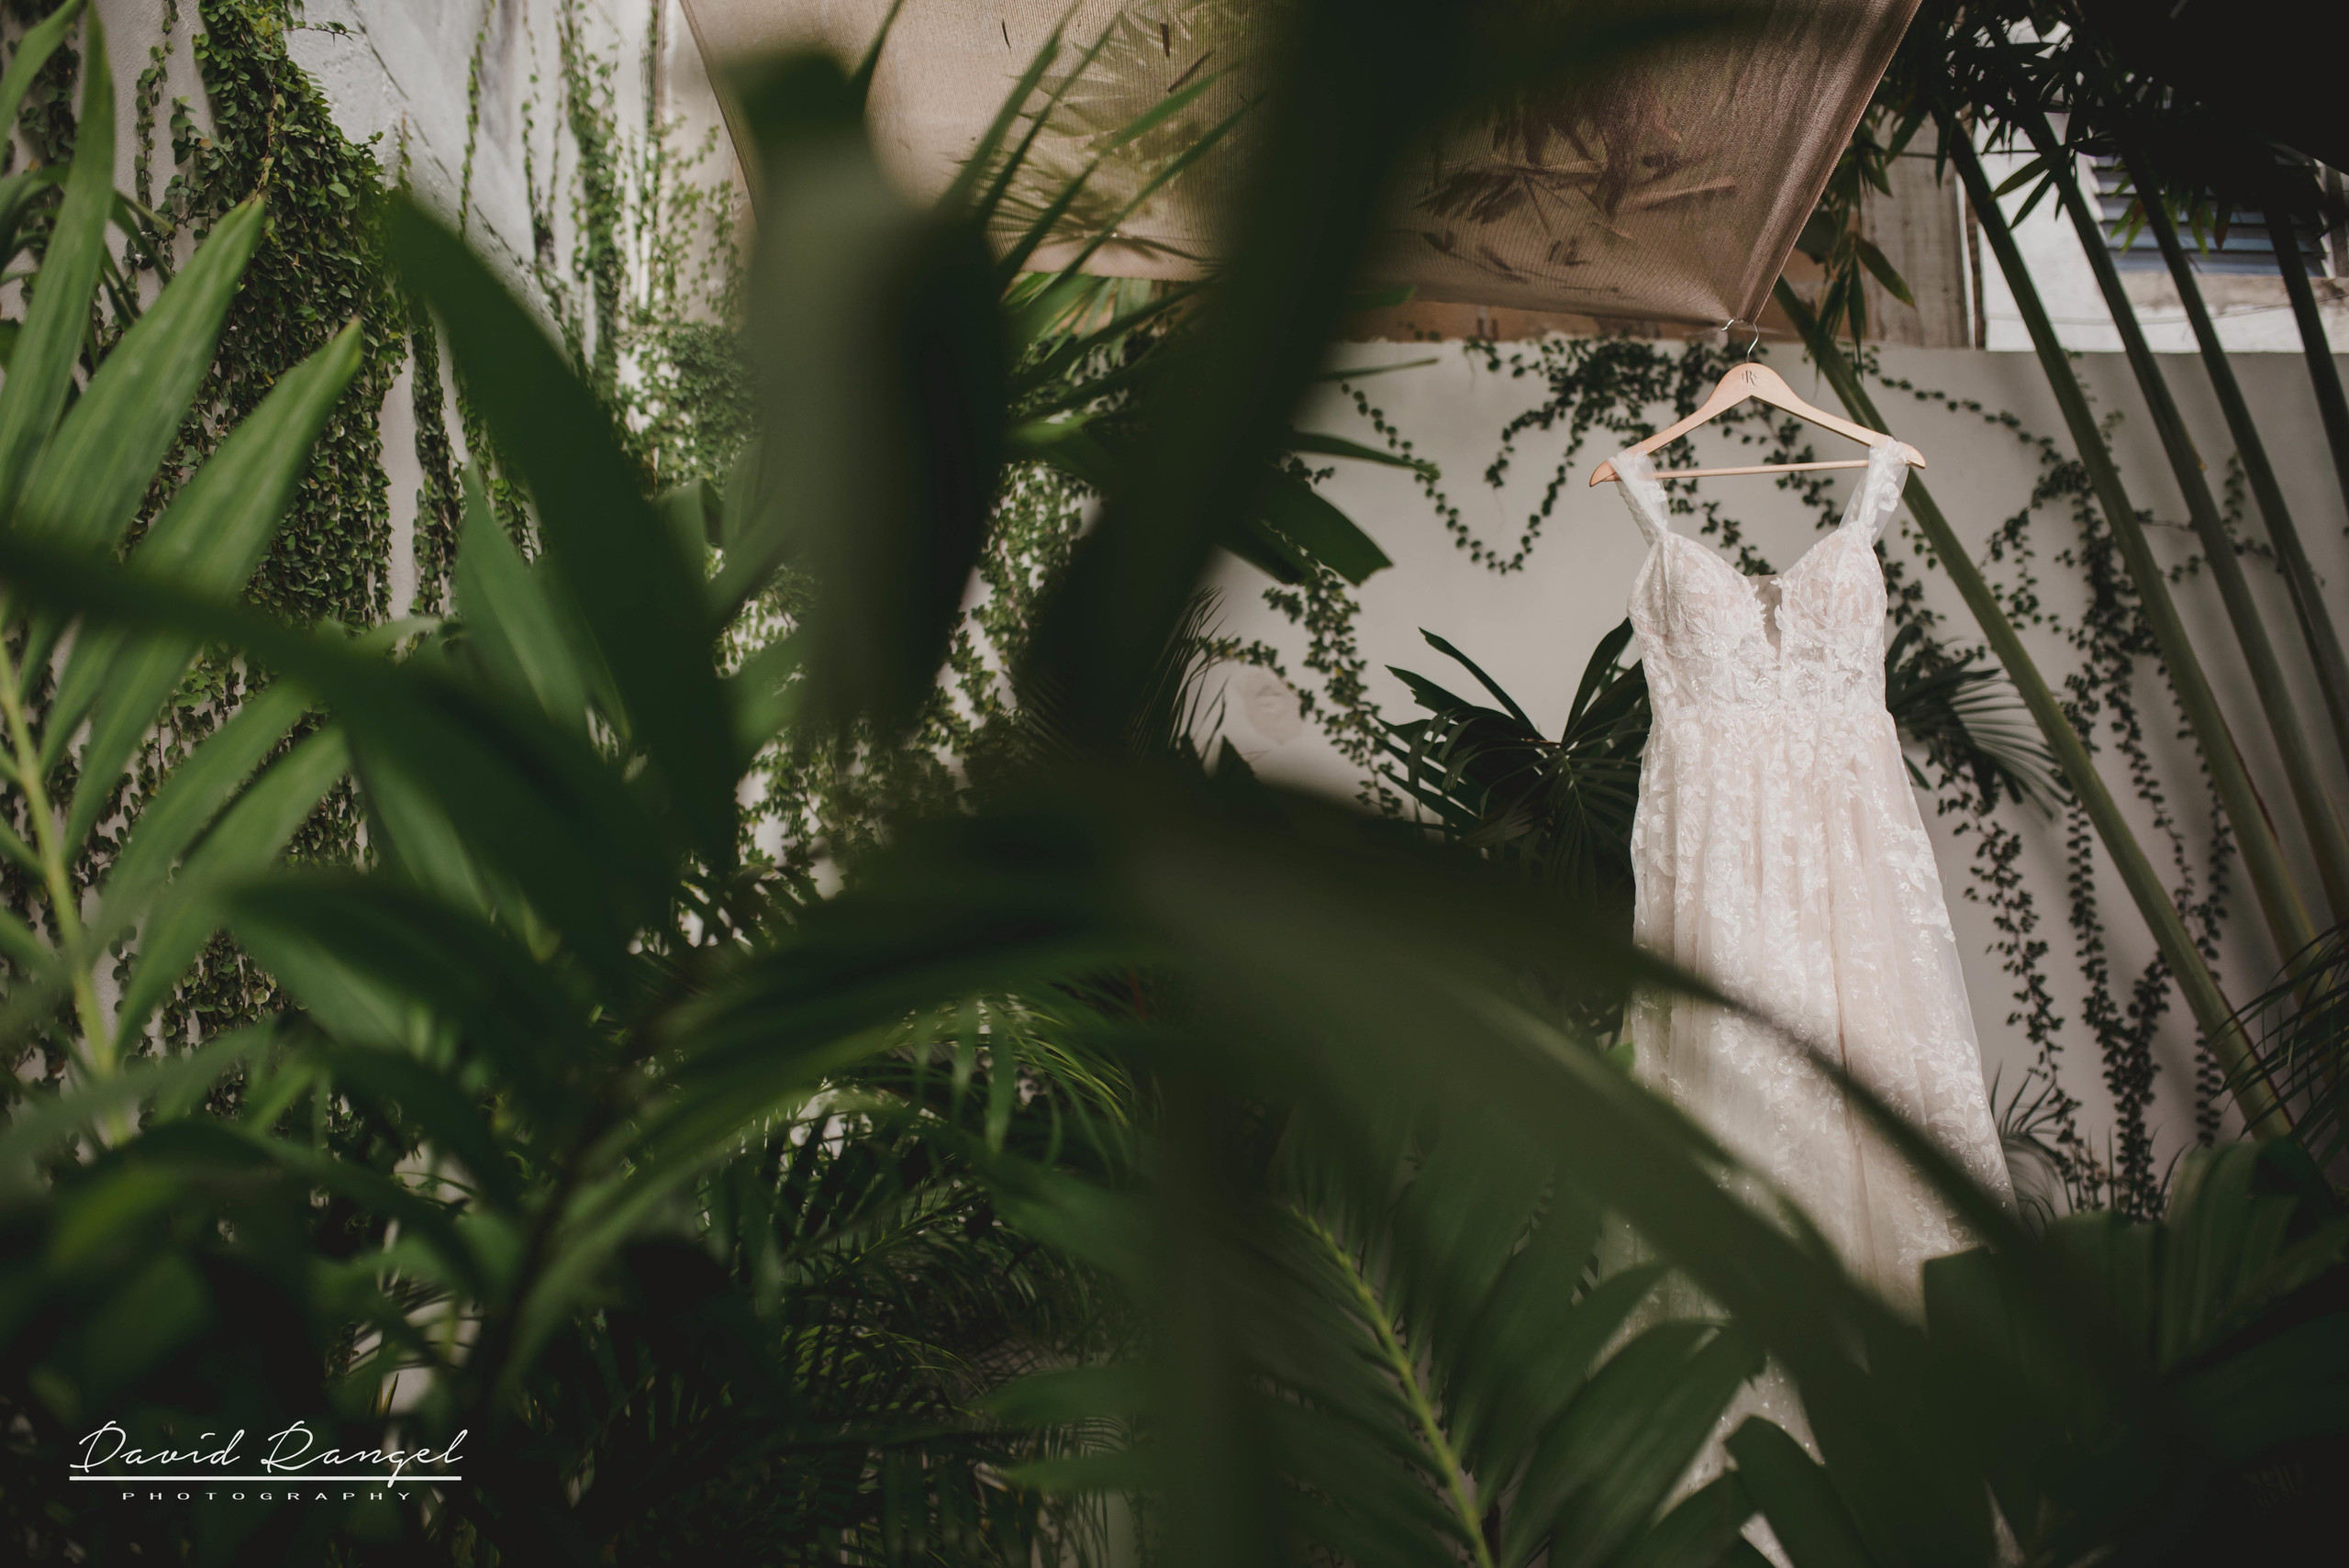 bride+getting+ready+shadow+earring++bathrobe+natural+ligh+photo+destination+wedding+isla+blanca+smile+champagne+mirror+photo+celebration+wedding+dress